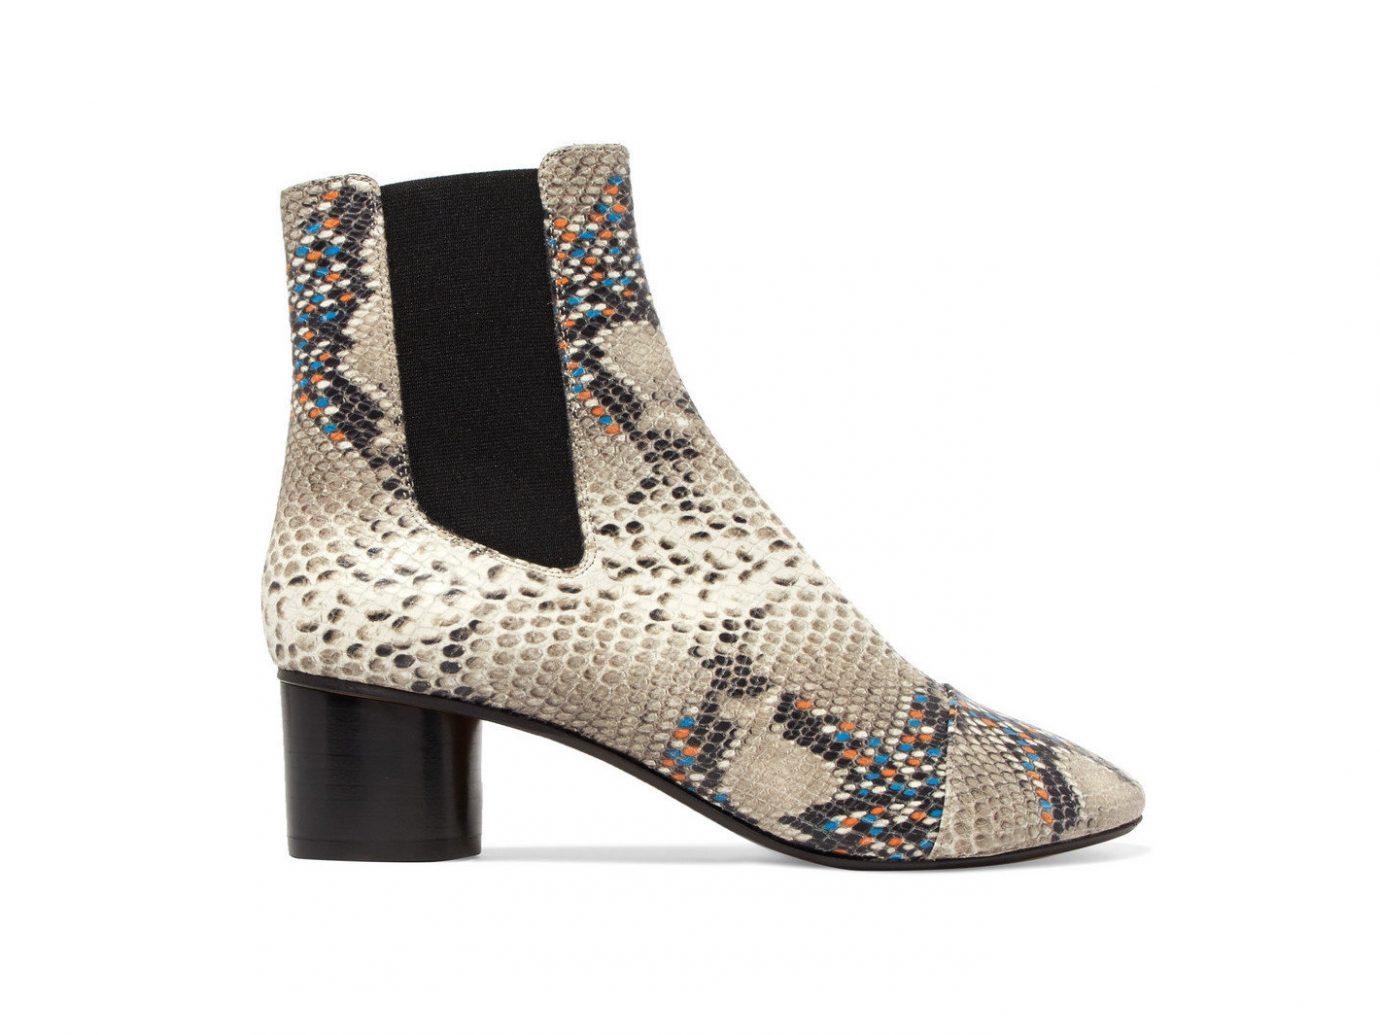 Spring Travel Style + Design Travel Shop footwear high heeled footwear boot shoe basic pump beige